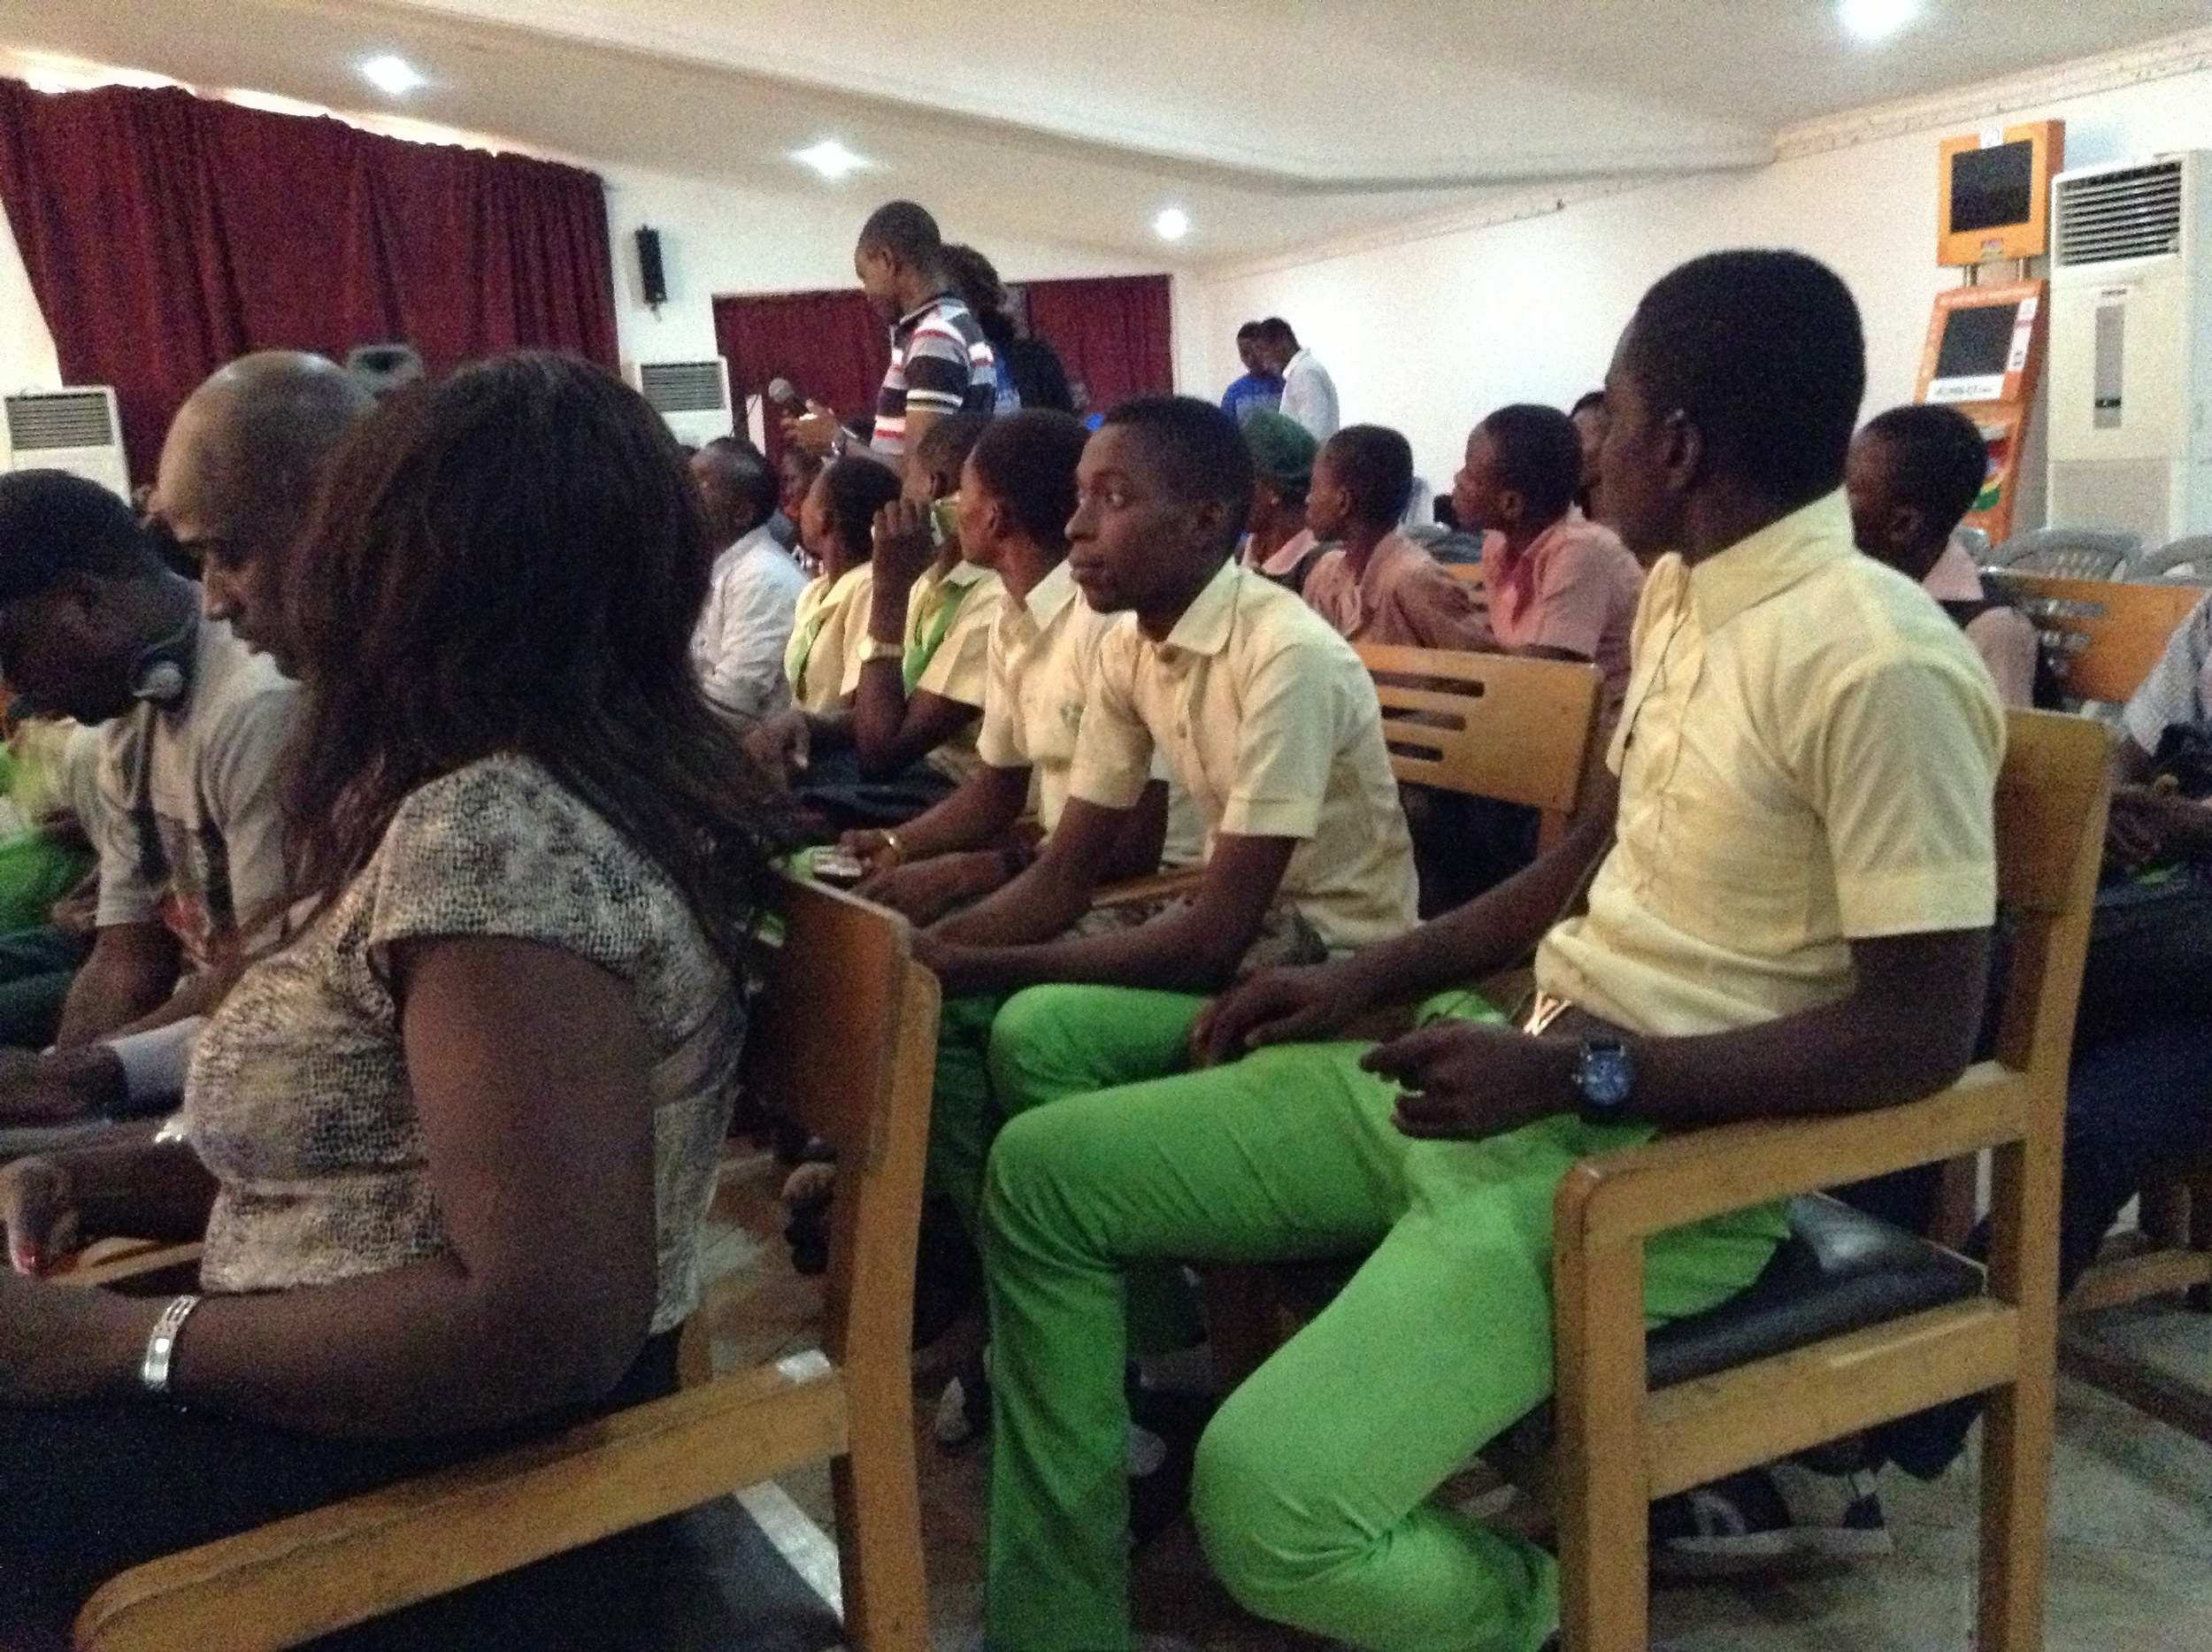 Students in the audience watching their peers.